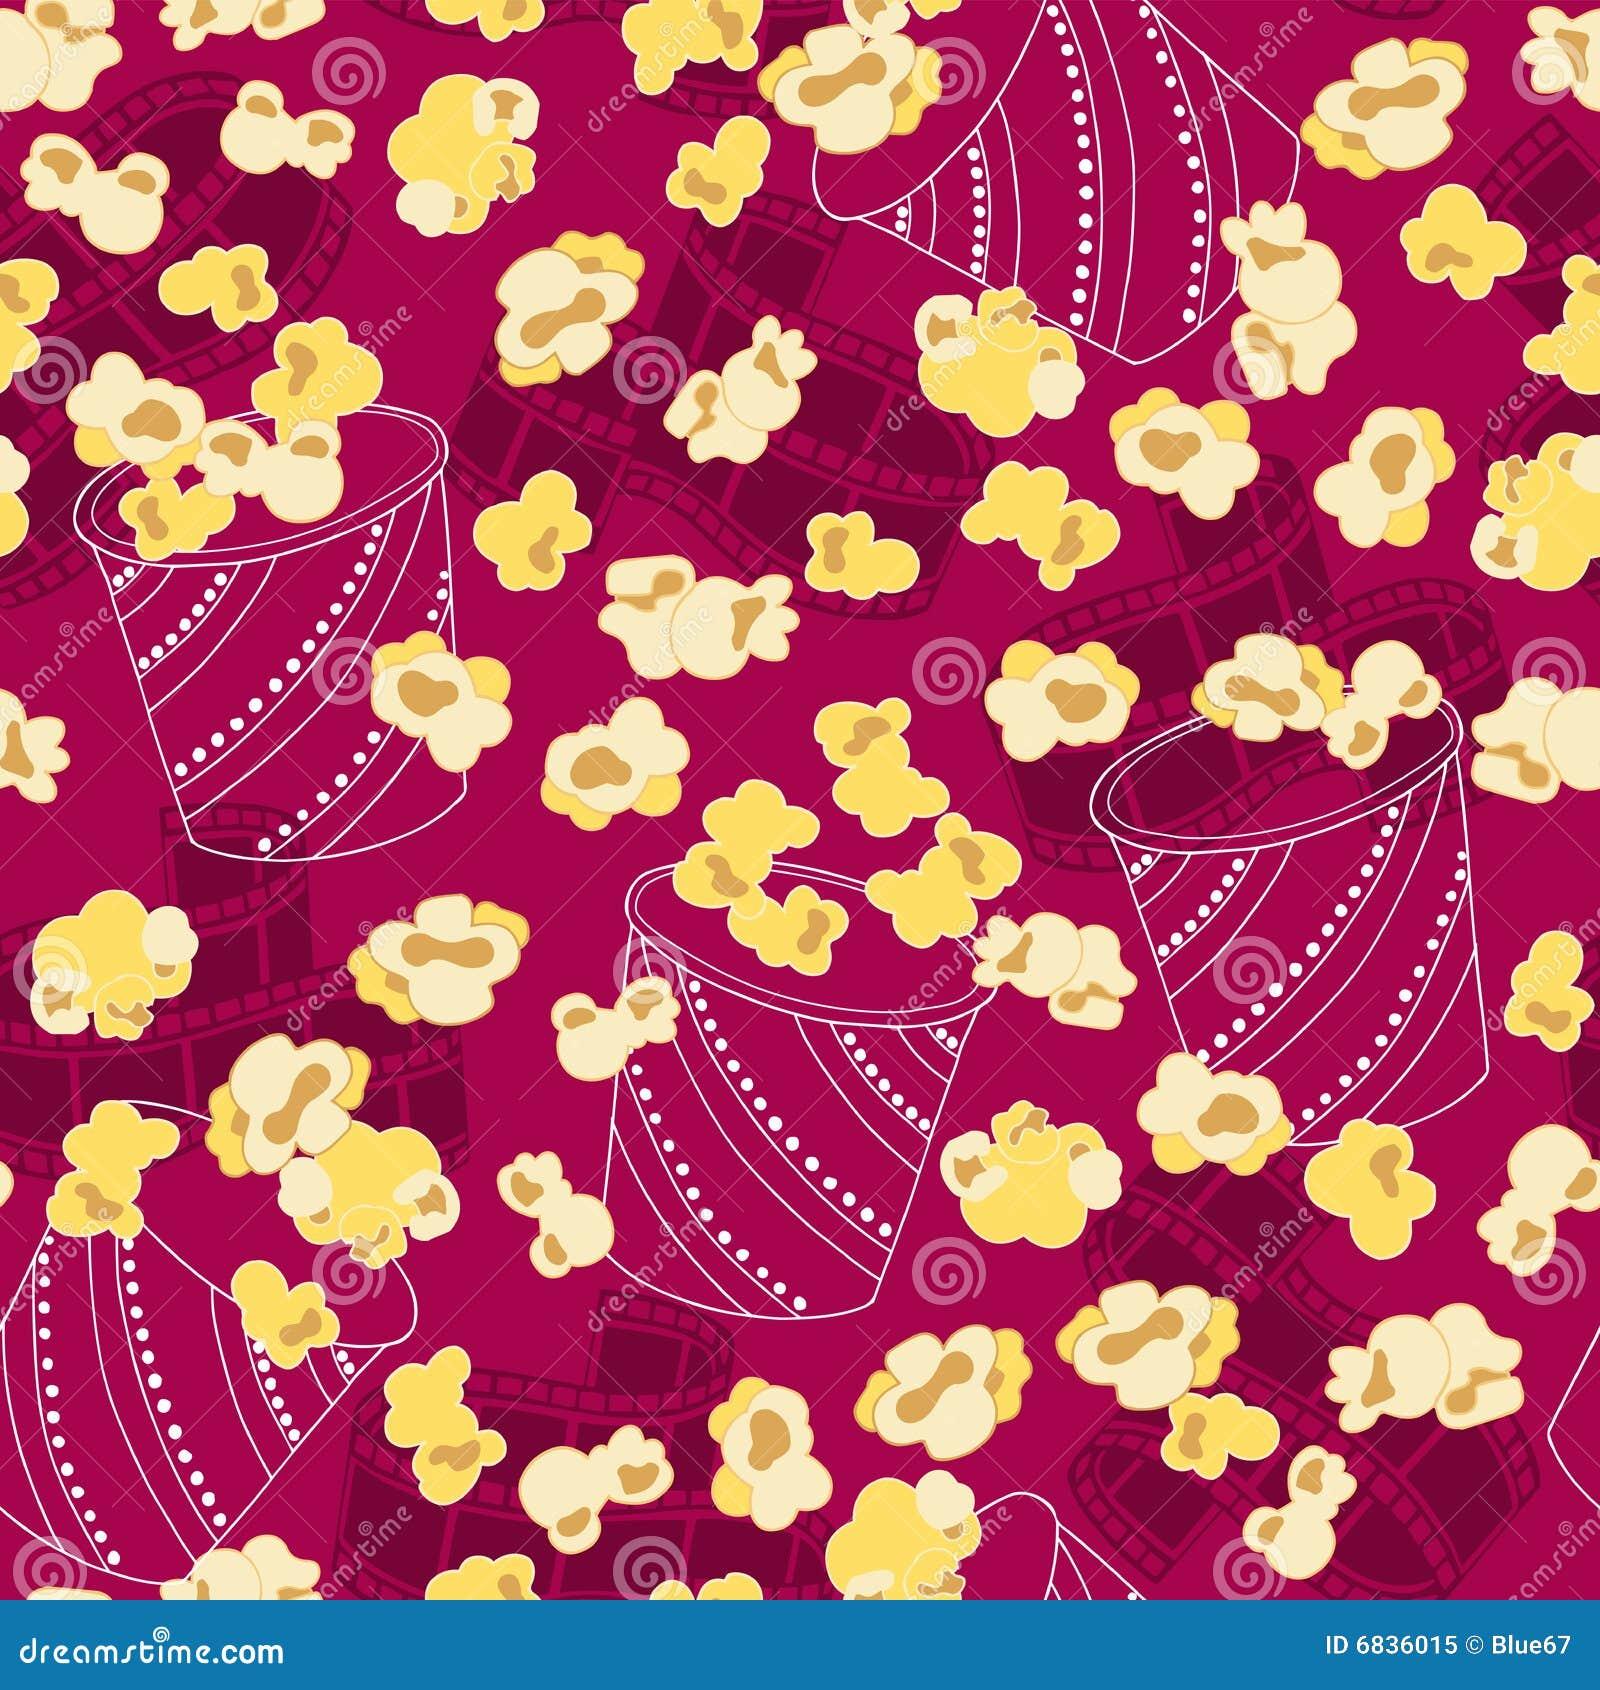 Popcorn Wallpaper: Popcorn Seamless Repeat Pattern Vector Royalty Free Stock